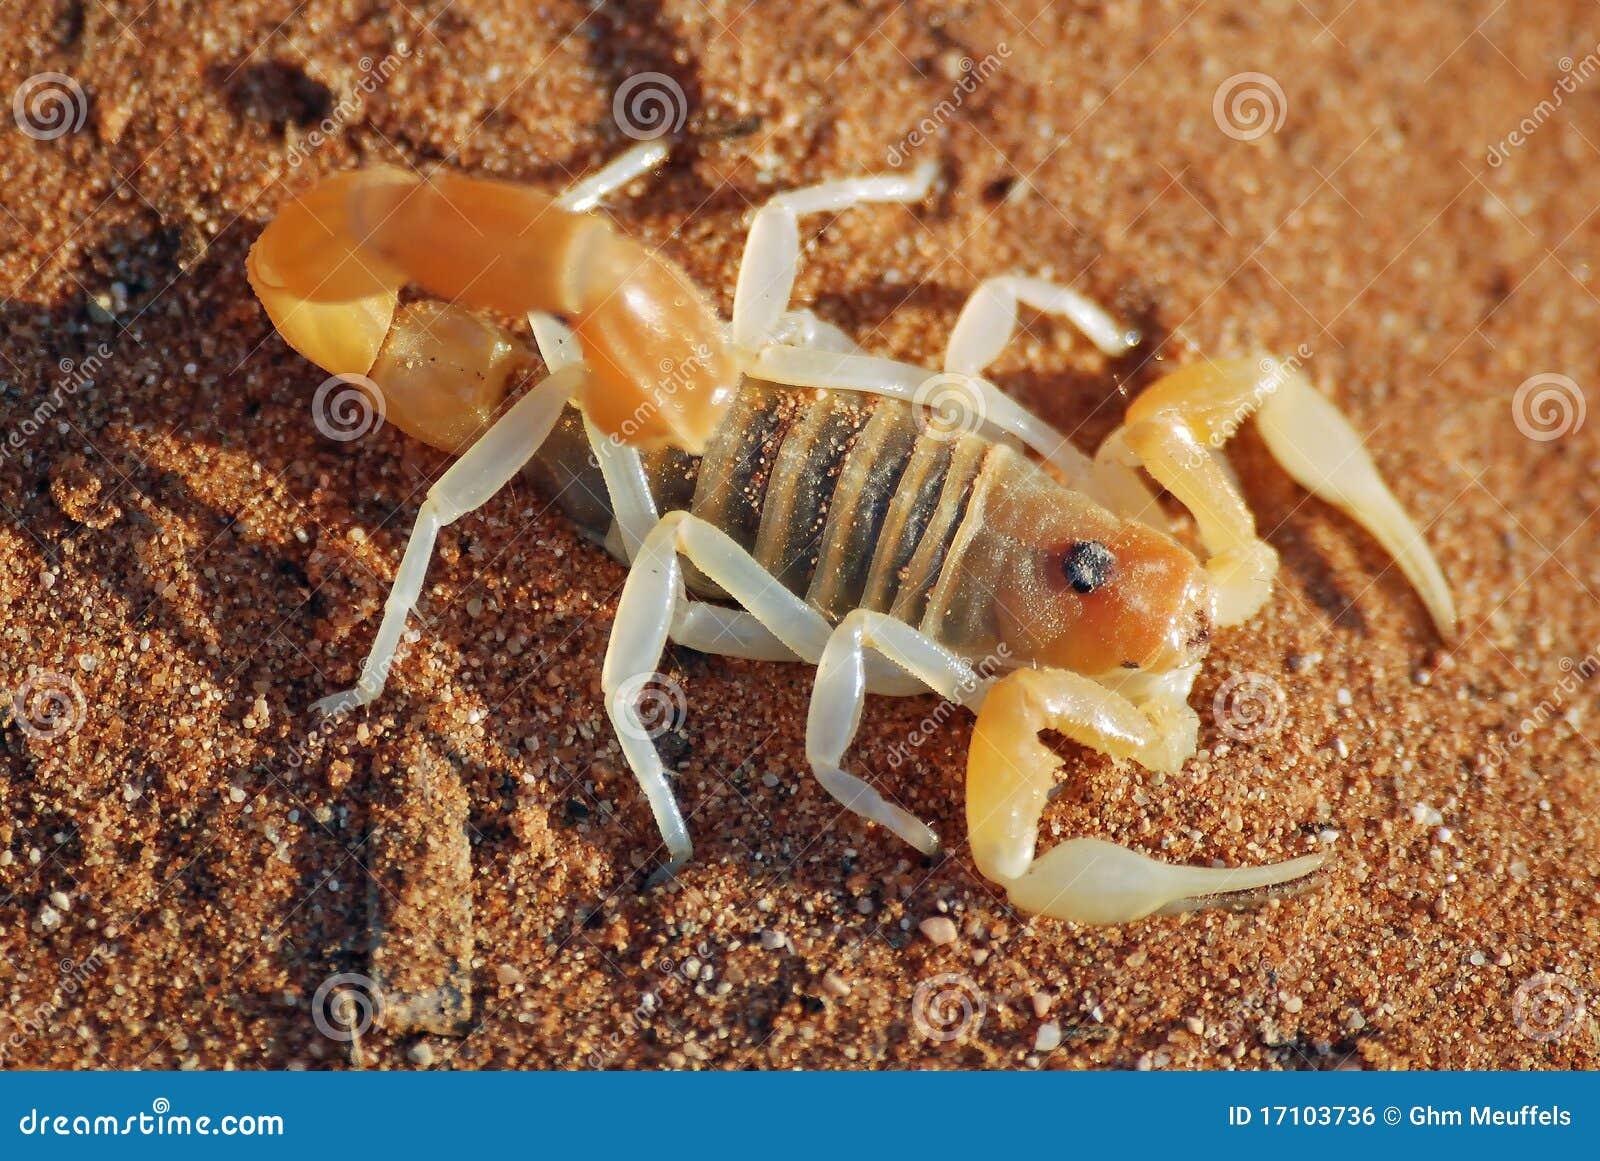 Nambia pustynny skorpion